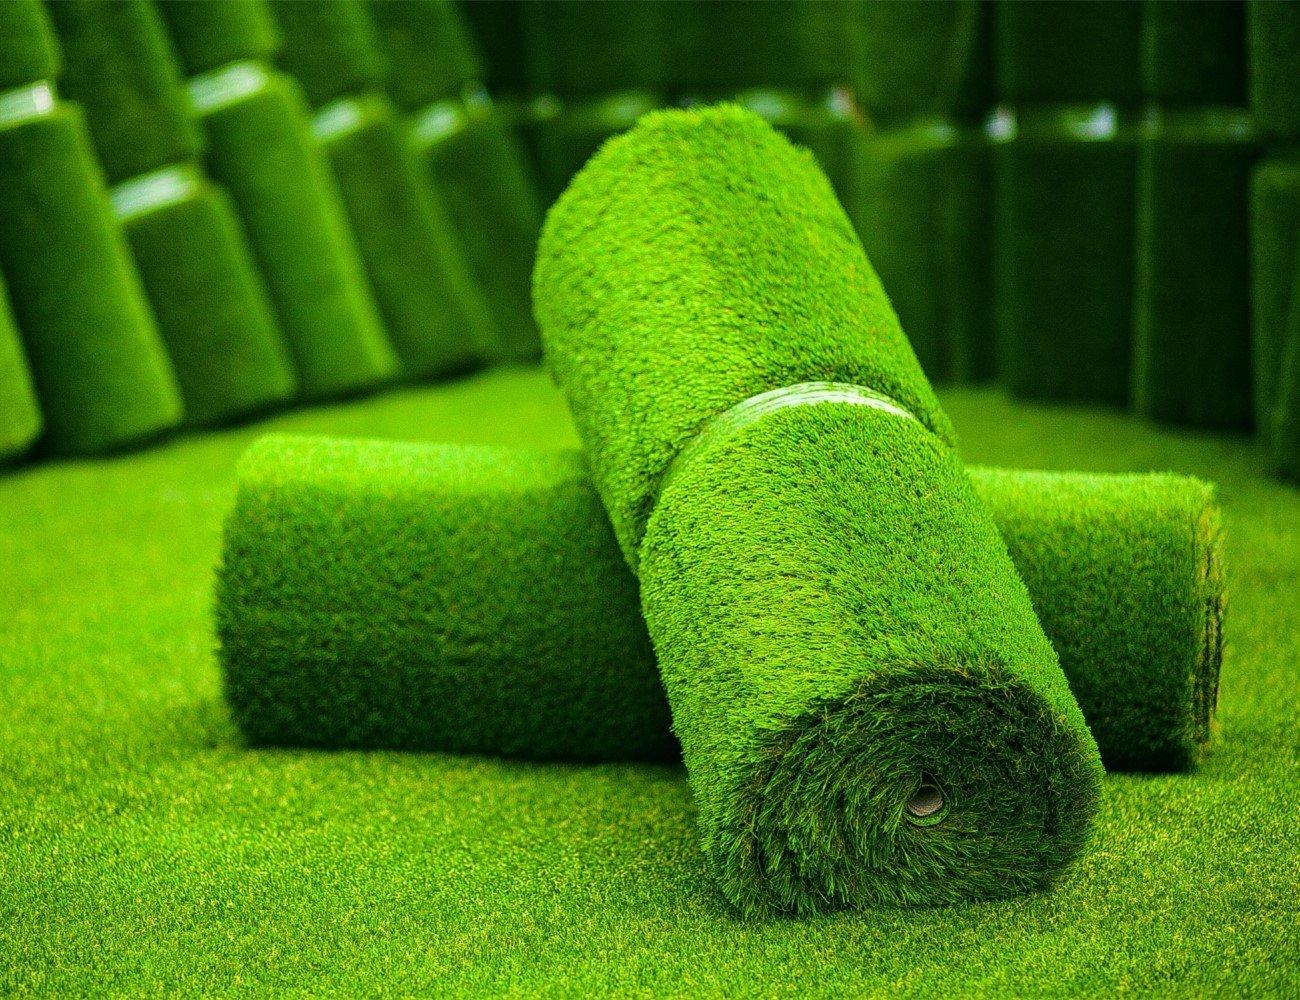 MTBRO Artificial Grass, Artificial Grass Rug, Indoor/Outdoor Artificial Turf, Blade Height 1.5'',100oz/sq.yard, (5 ft X 13 ft)